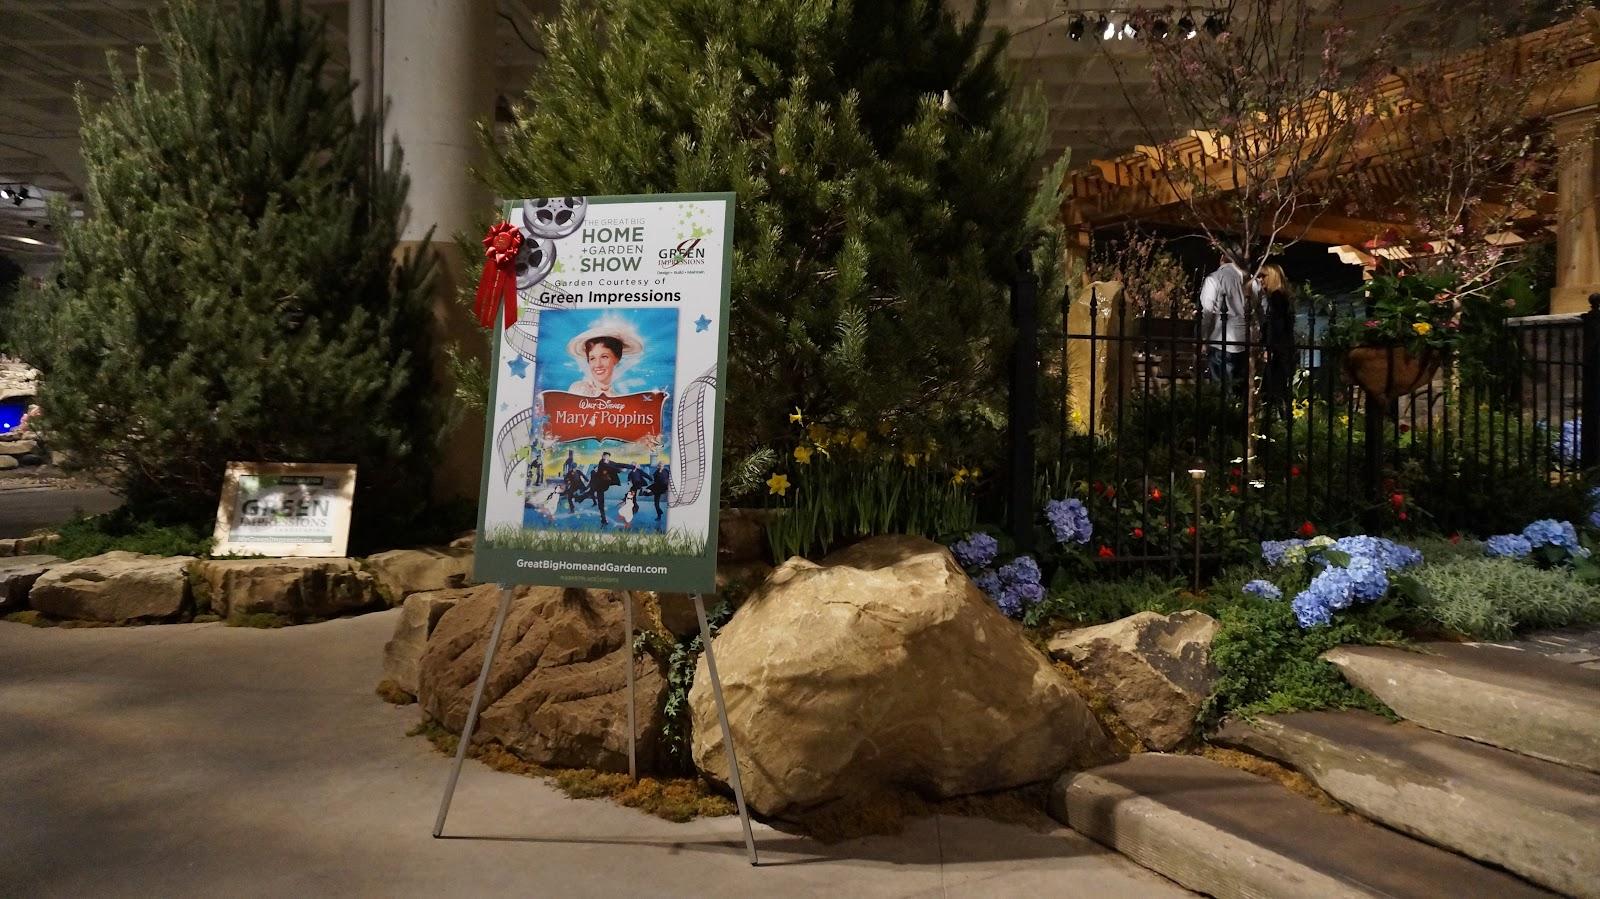 Mary-Poppins-themed-garden-showcase